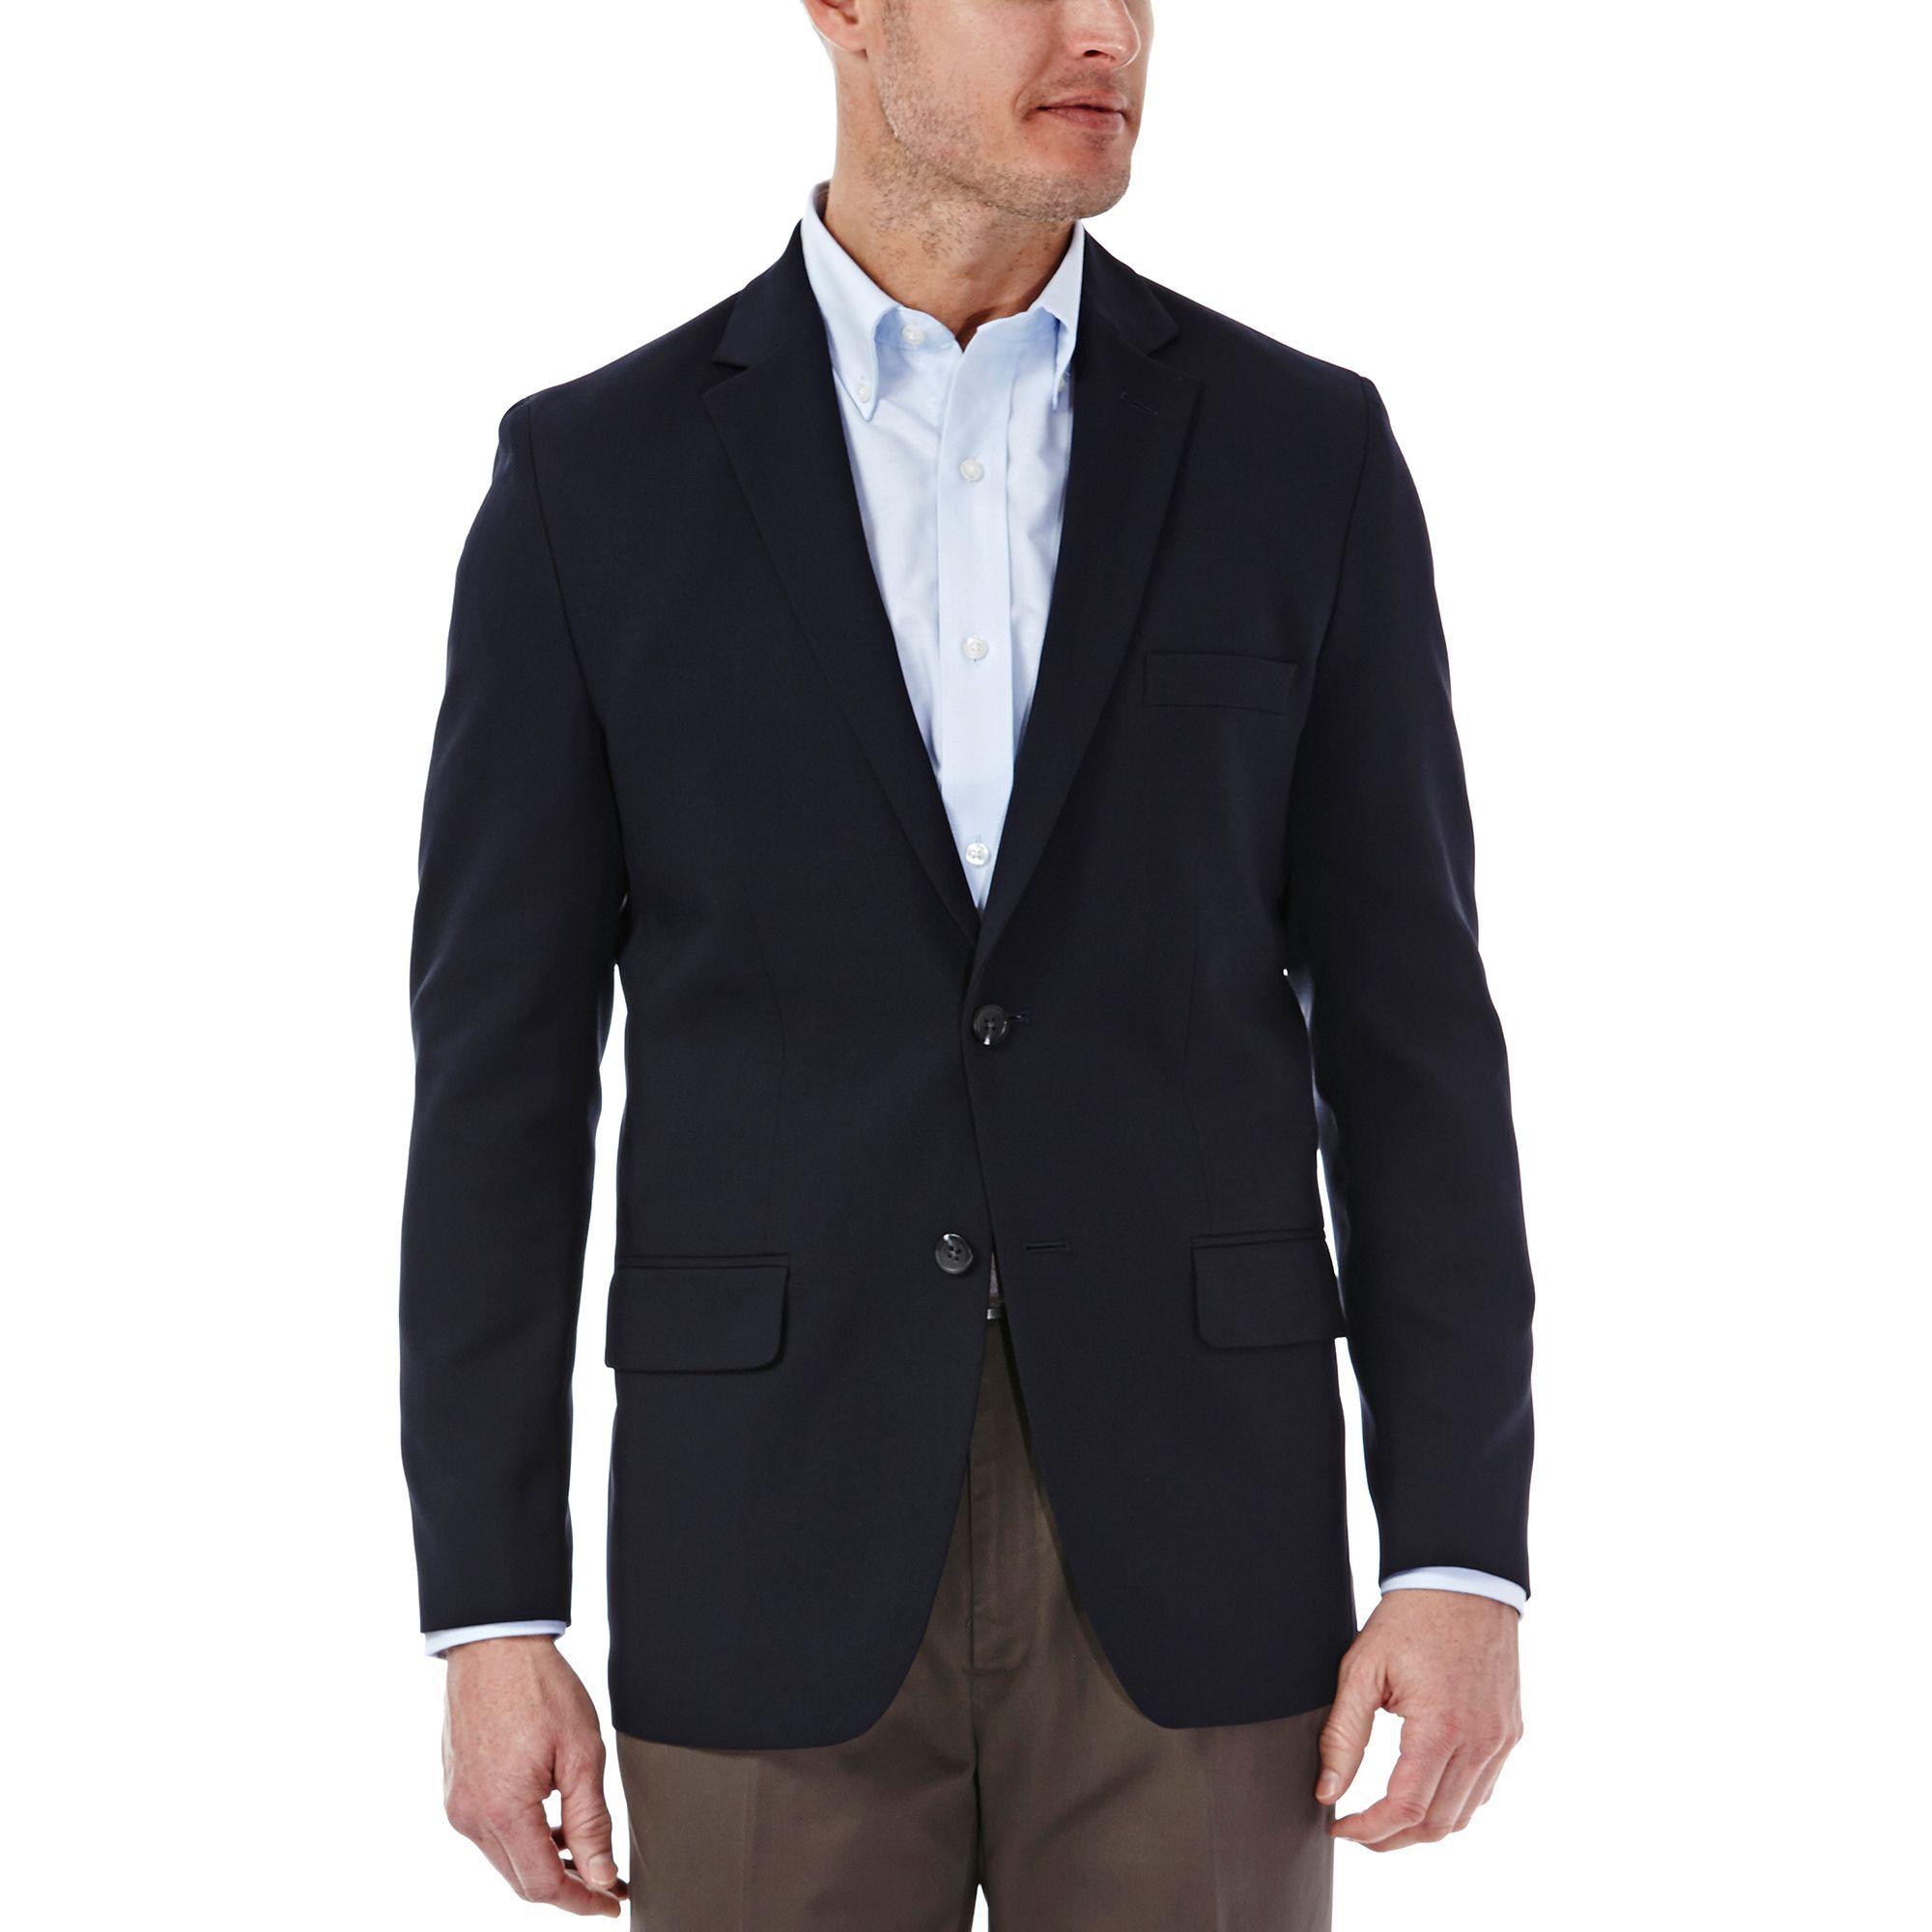 Men's Sport Coats - Tailored Blazers at Haggar